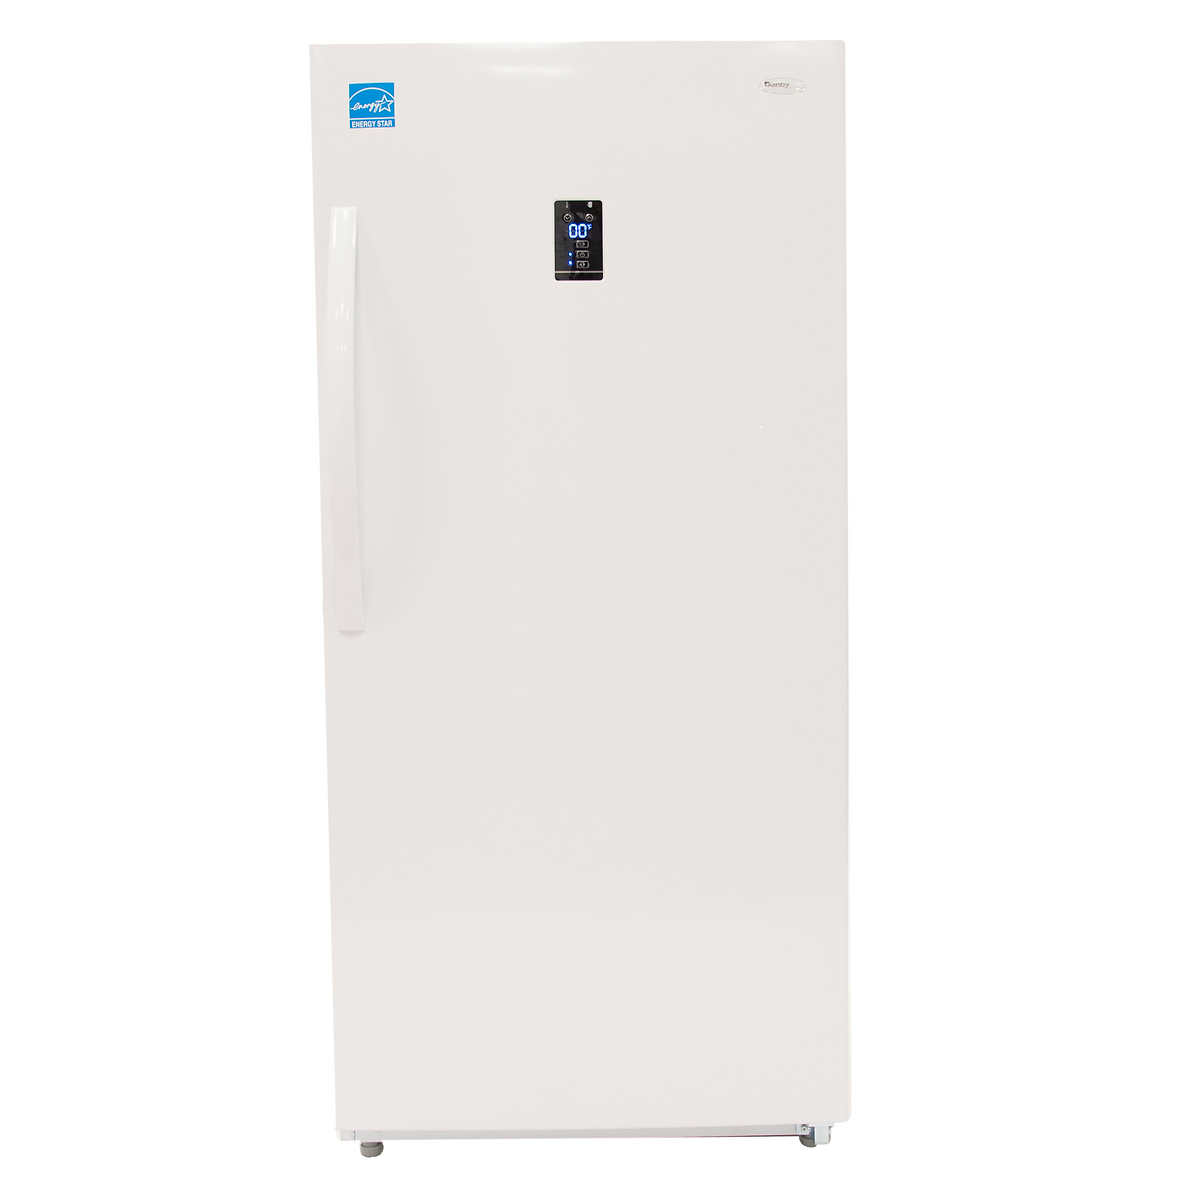 Danby 13 8CuFt, White Upright Freezer, DUF140E1WDD